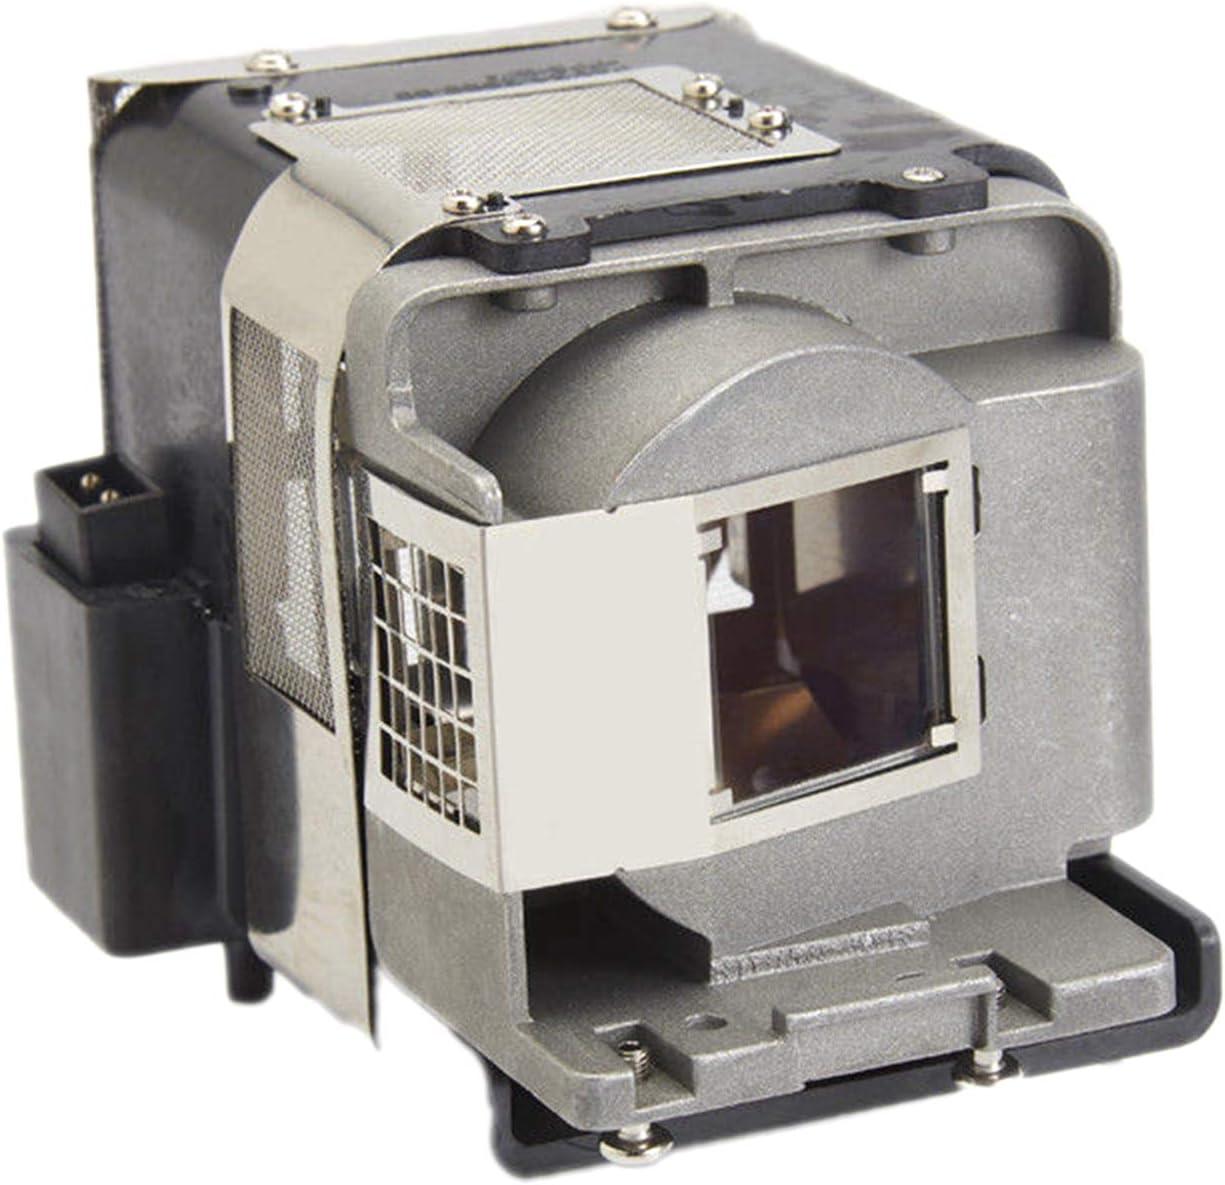 CARSN VLT-XD600LP VLT-XD700LP Projector Lamp w/Housing for Mitsubishi FD630U WD620U XD600 XD600LP XD600U Projector Replacement Lamp Bulb